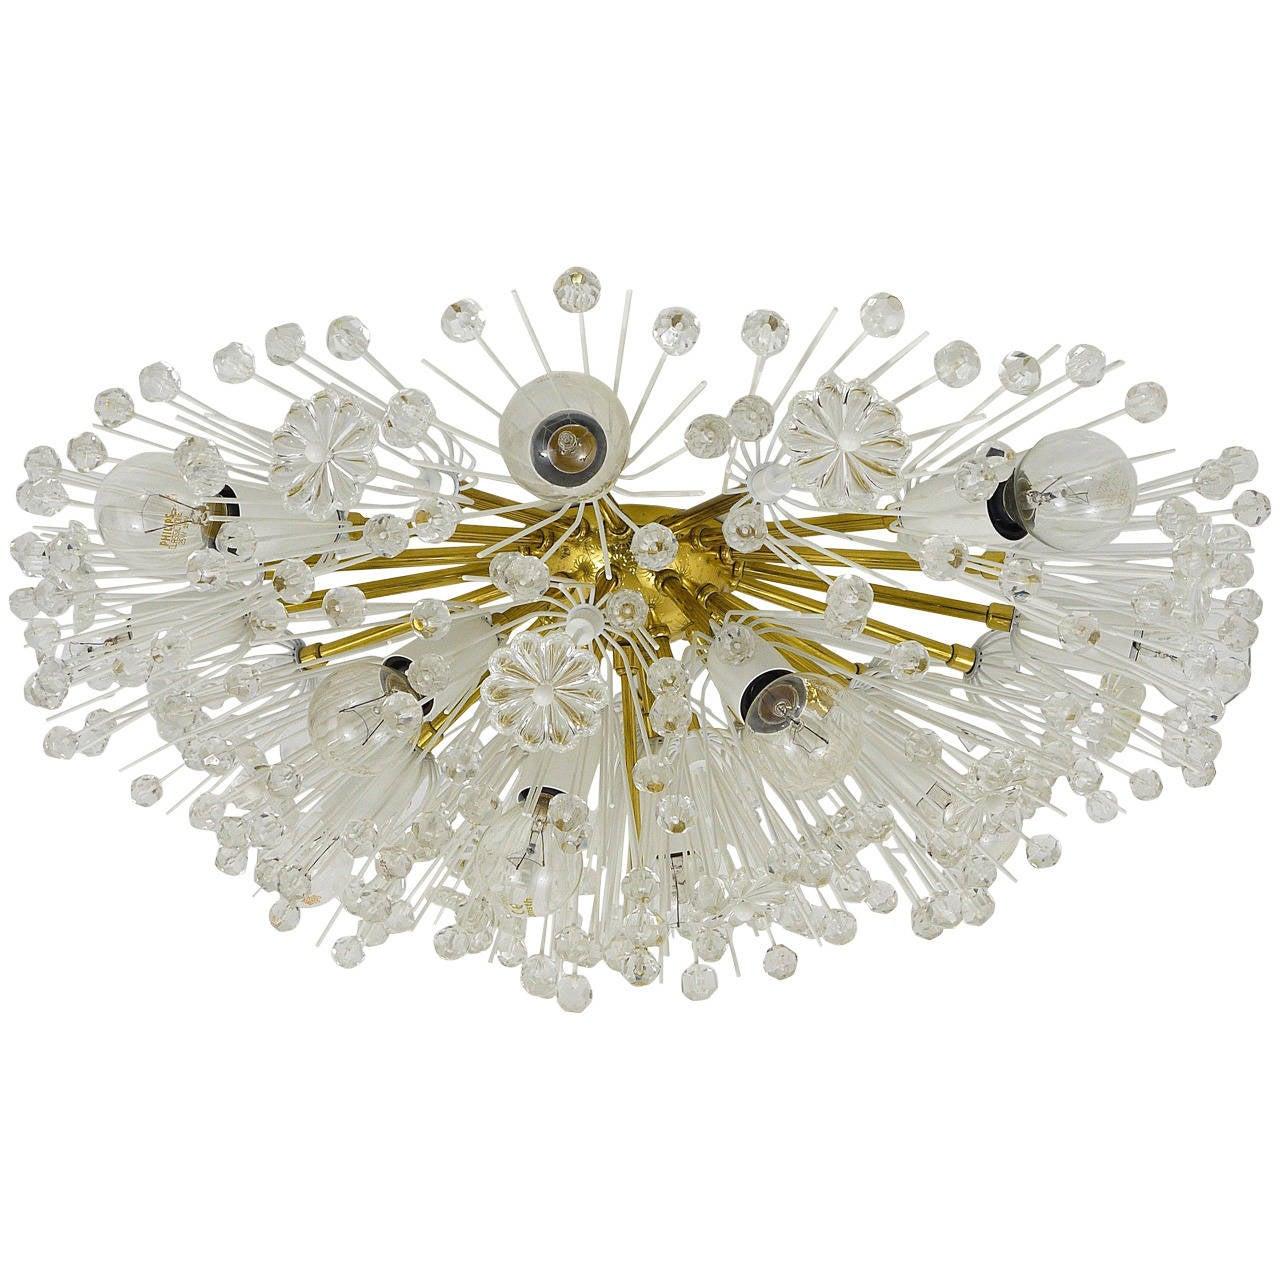 Austrian Emil Stejnar Brass Crystal Flush Mount or Sconce, Rupert Nikoll, 1950s For Sale